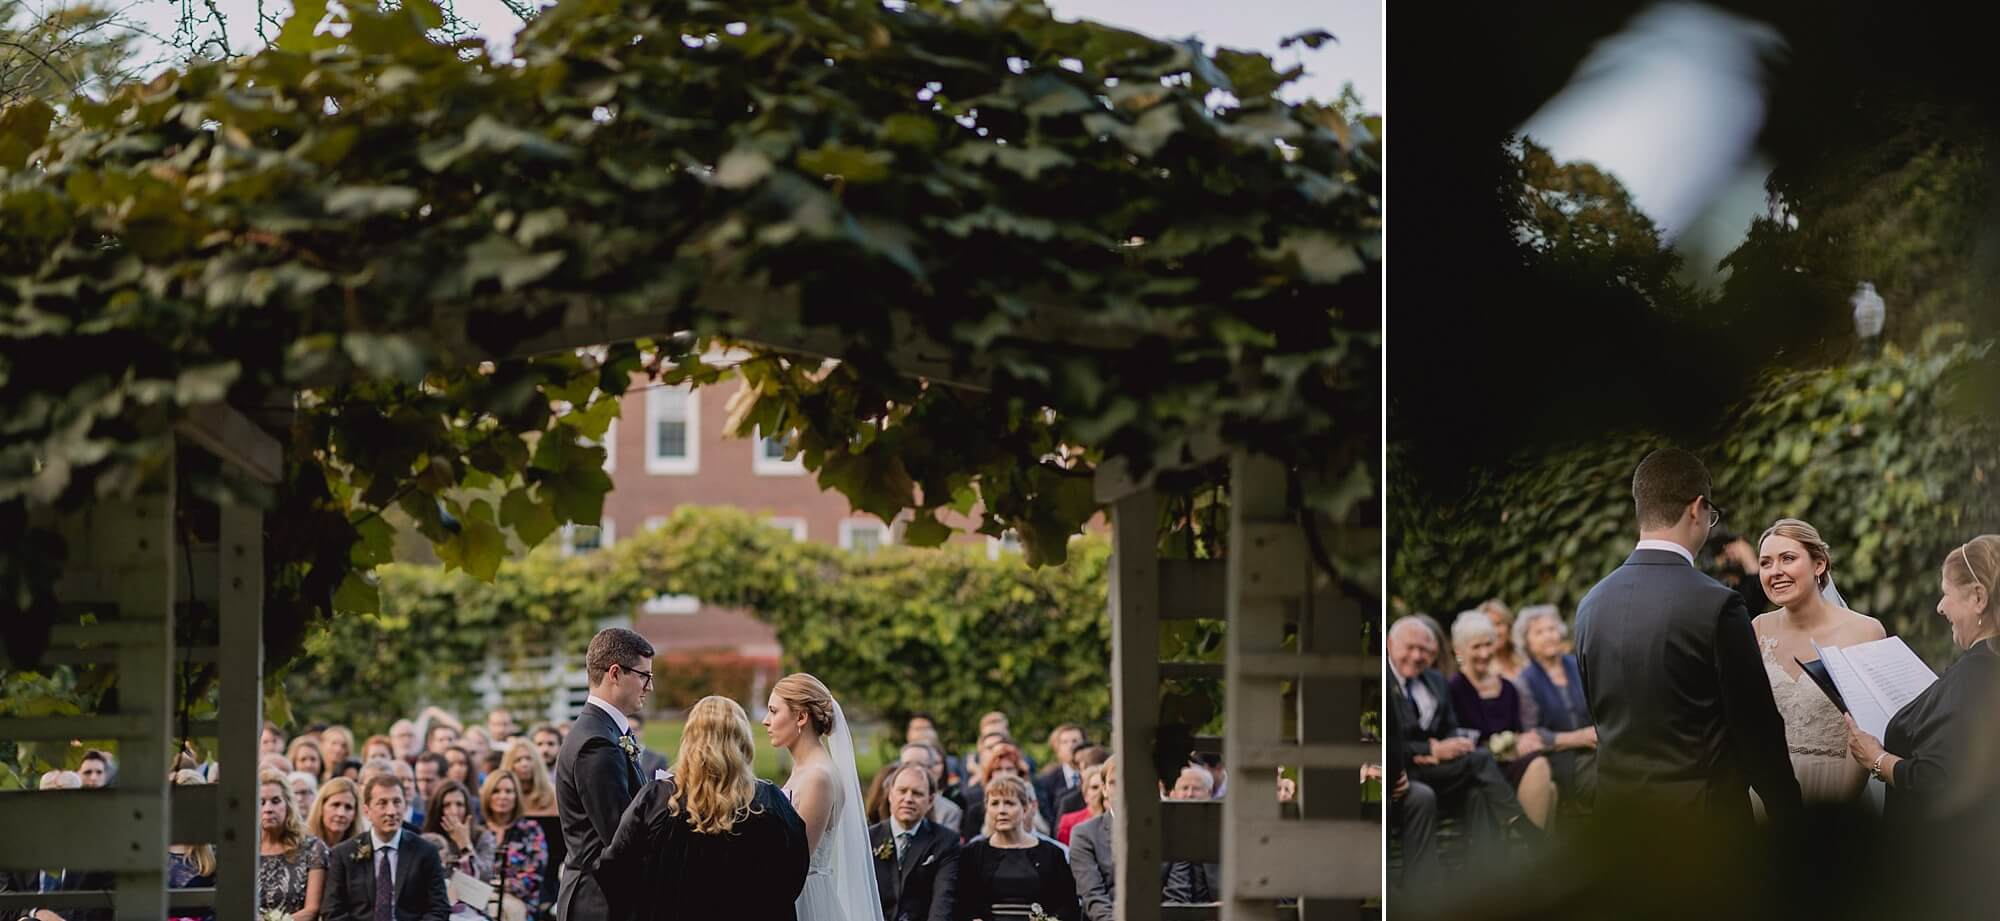 Commanders Mansion Wedding - Ebersole Photo_0019.jpg